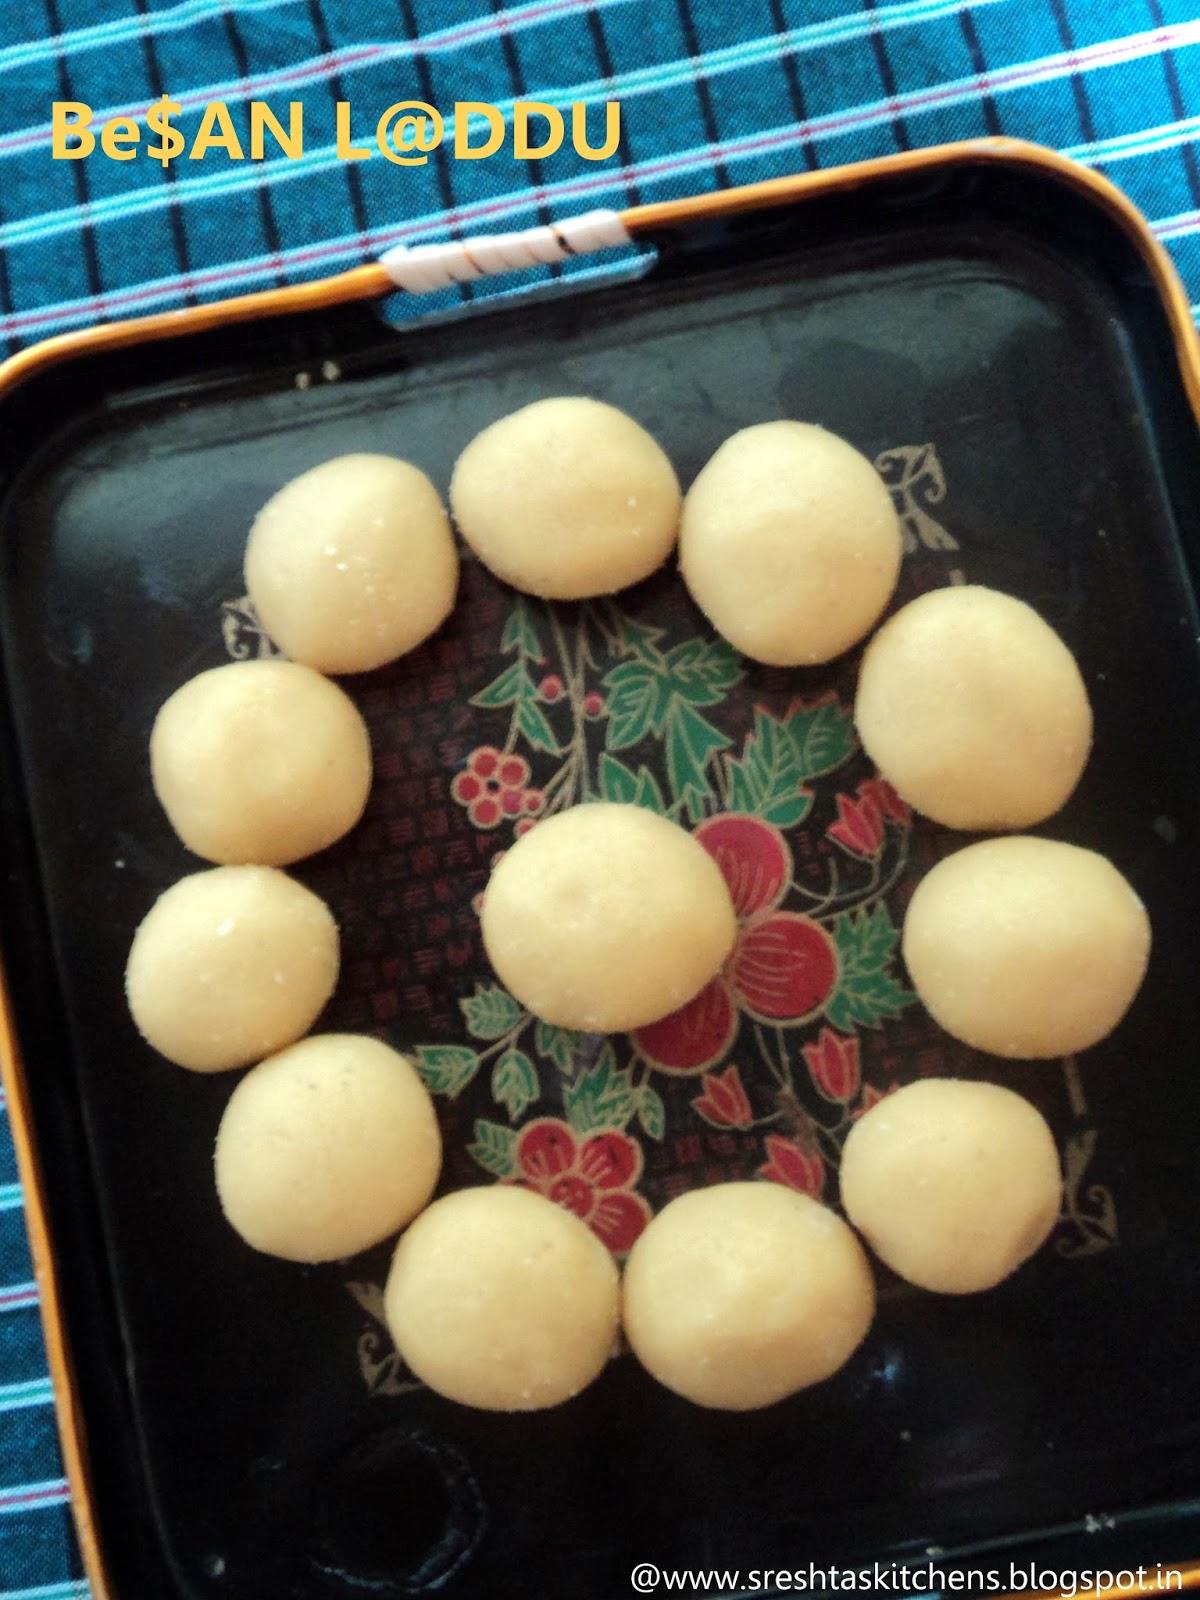 http://sreshtaskitchens.blogspot.in/2014/10/besan-laddu-is-very-simple-laddu-recipe.html